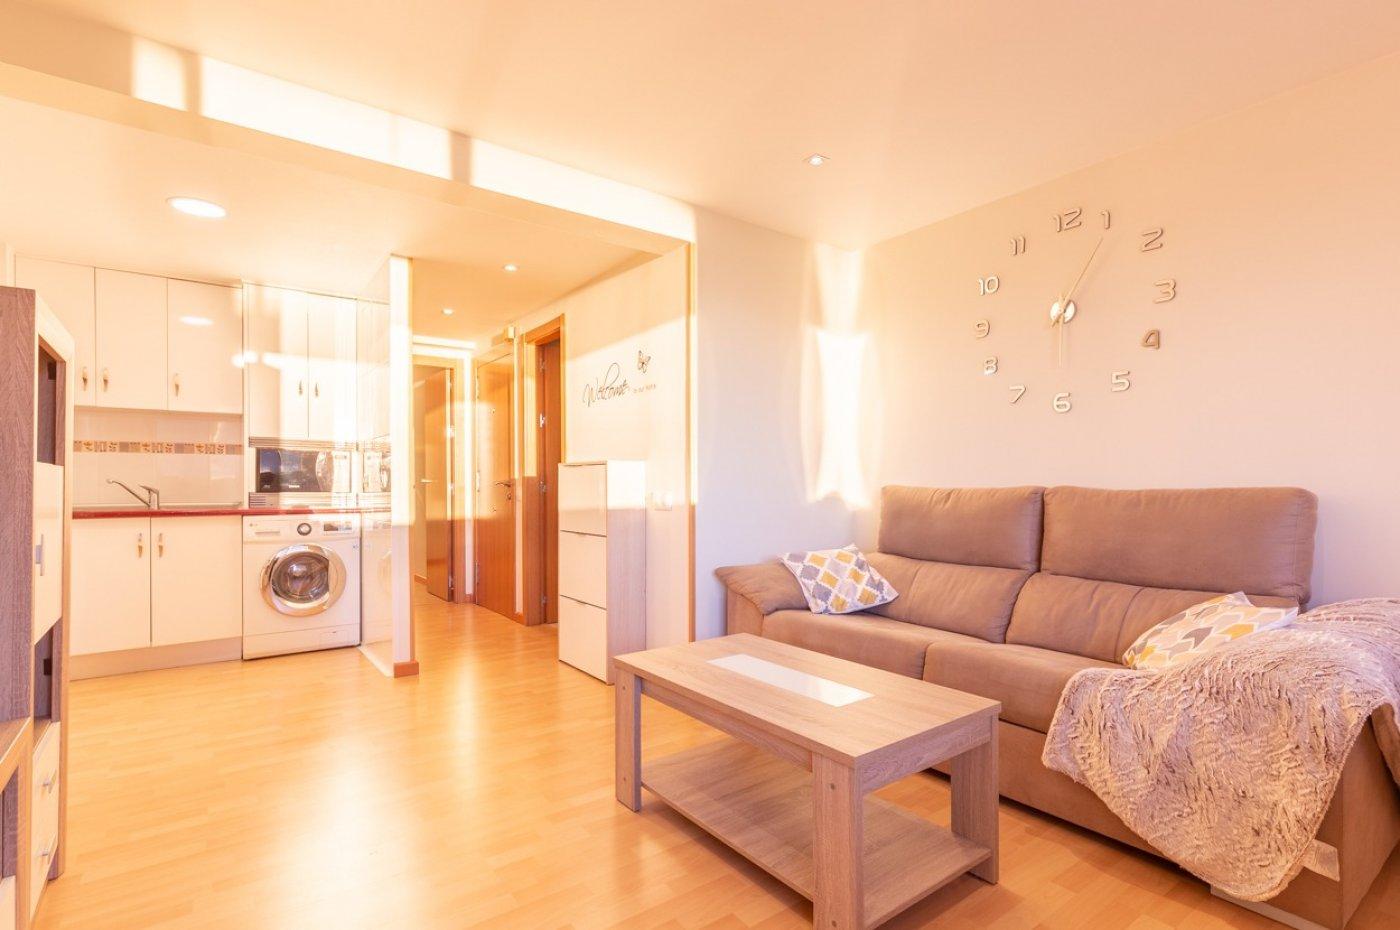 Apartamento en Benidorm zona Rincon de Loix de 49 m²